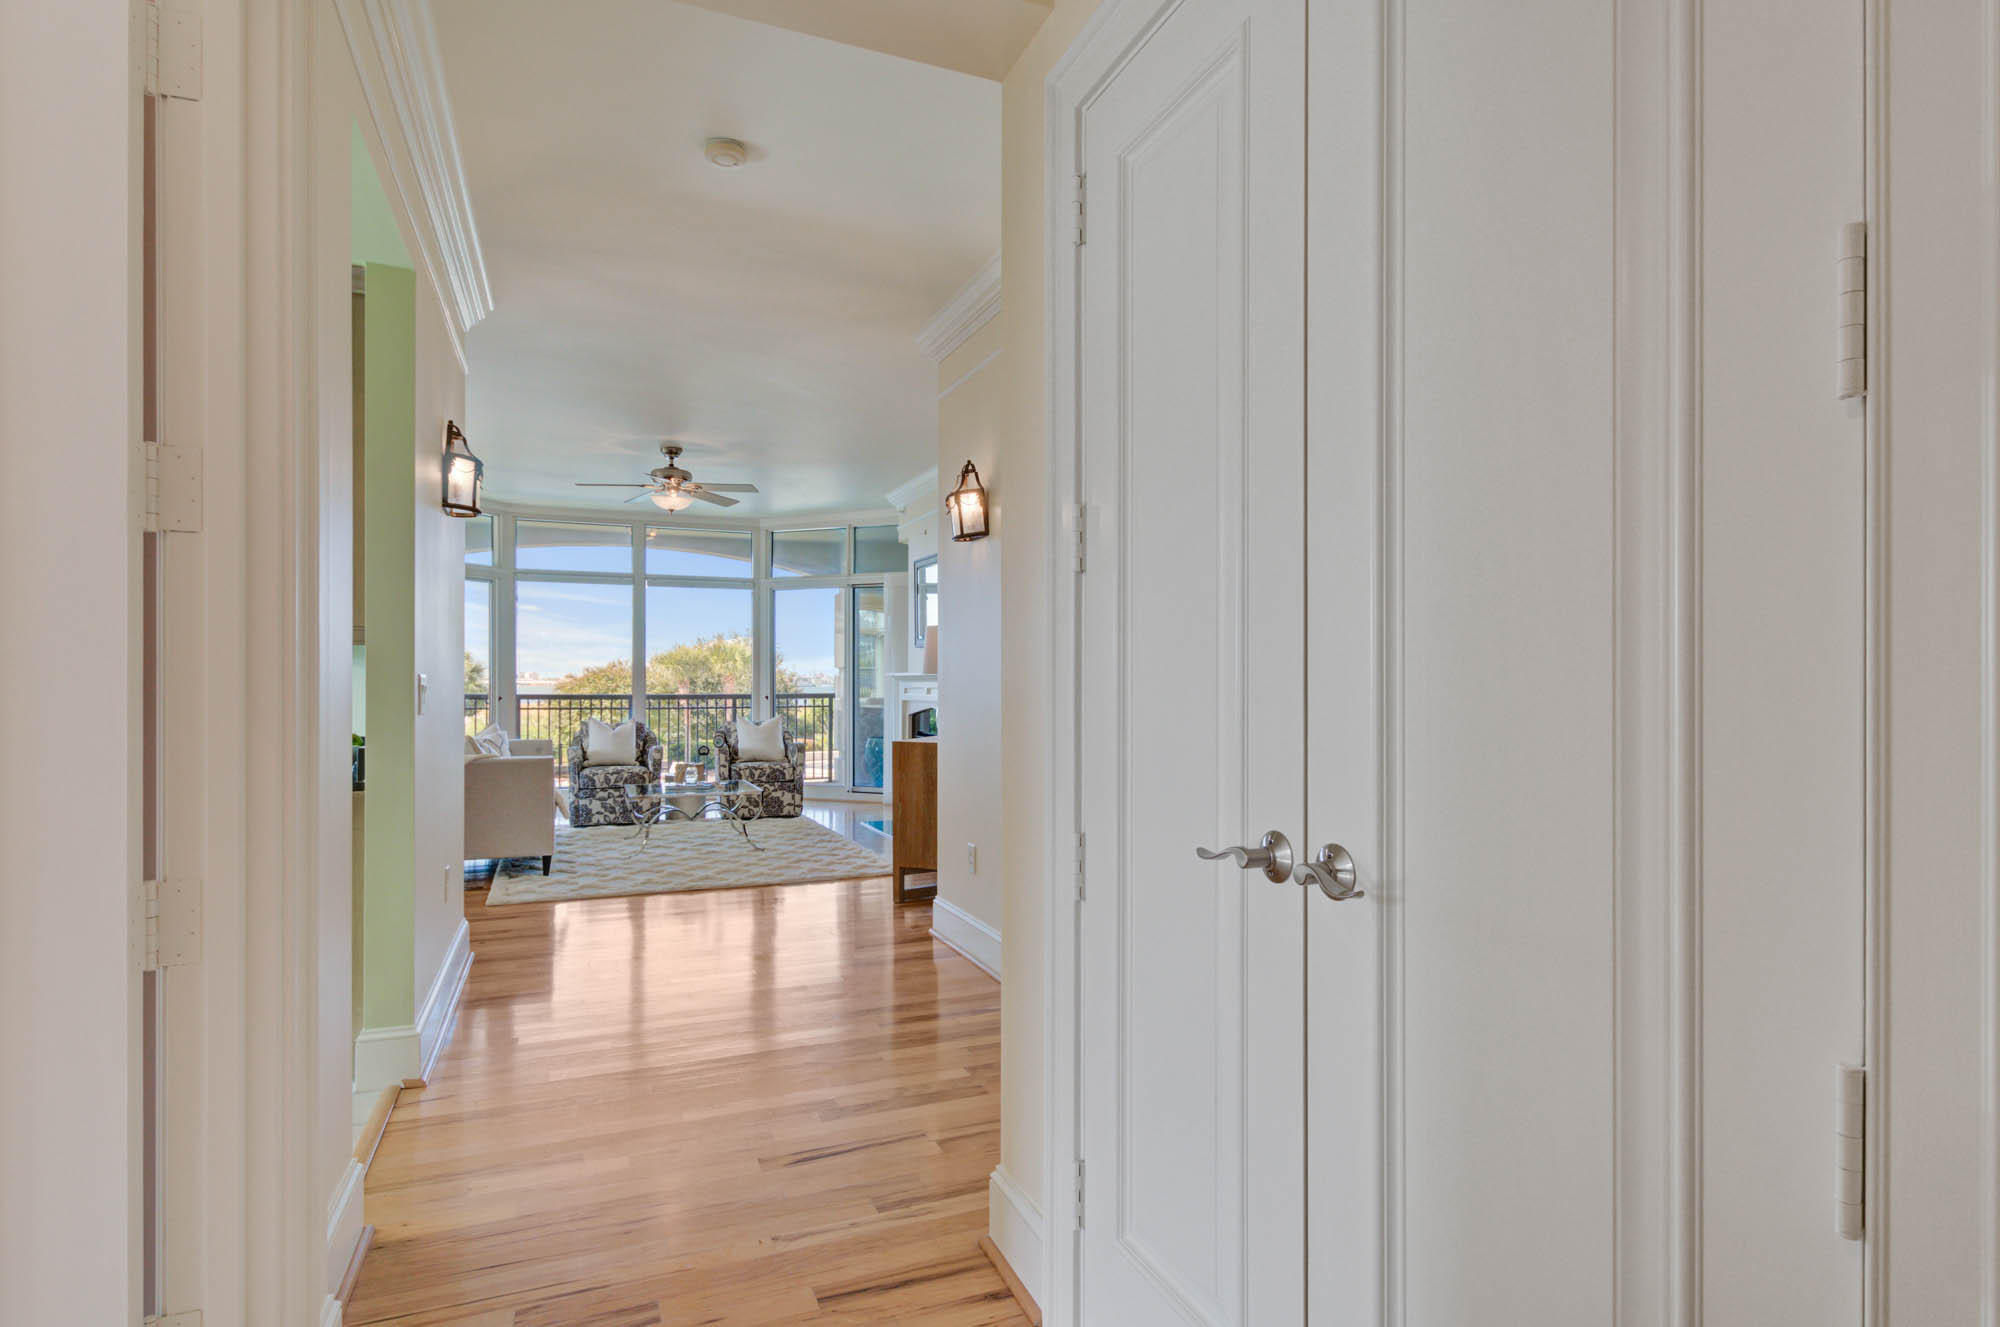 Renaissance On Chas Harbor Homes For Sale - 125 Plaza, Mount Pleasant, SC - 1